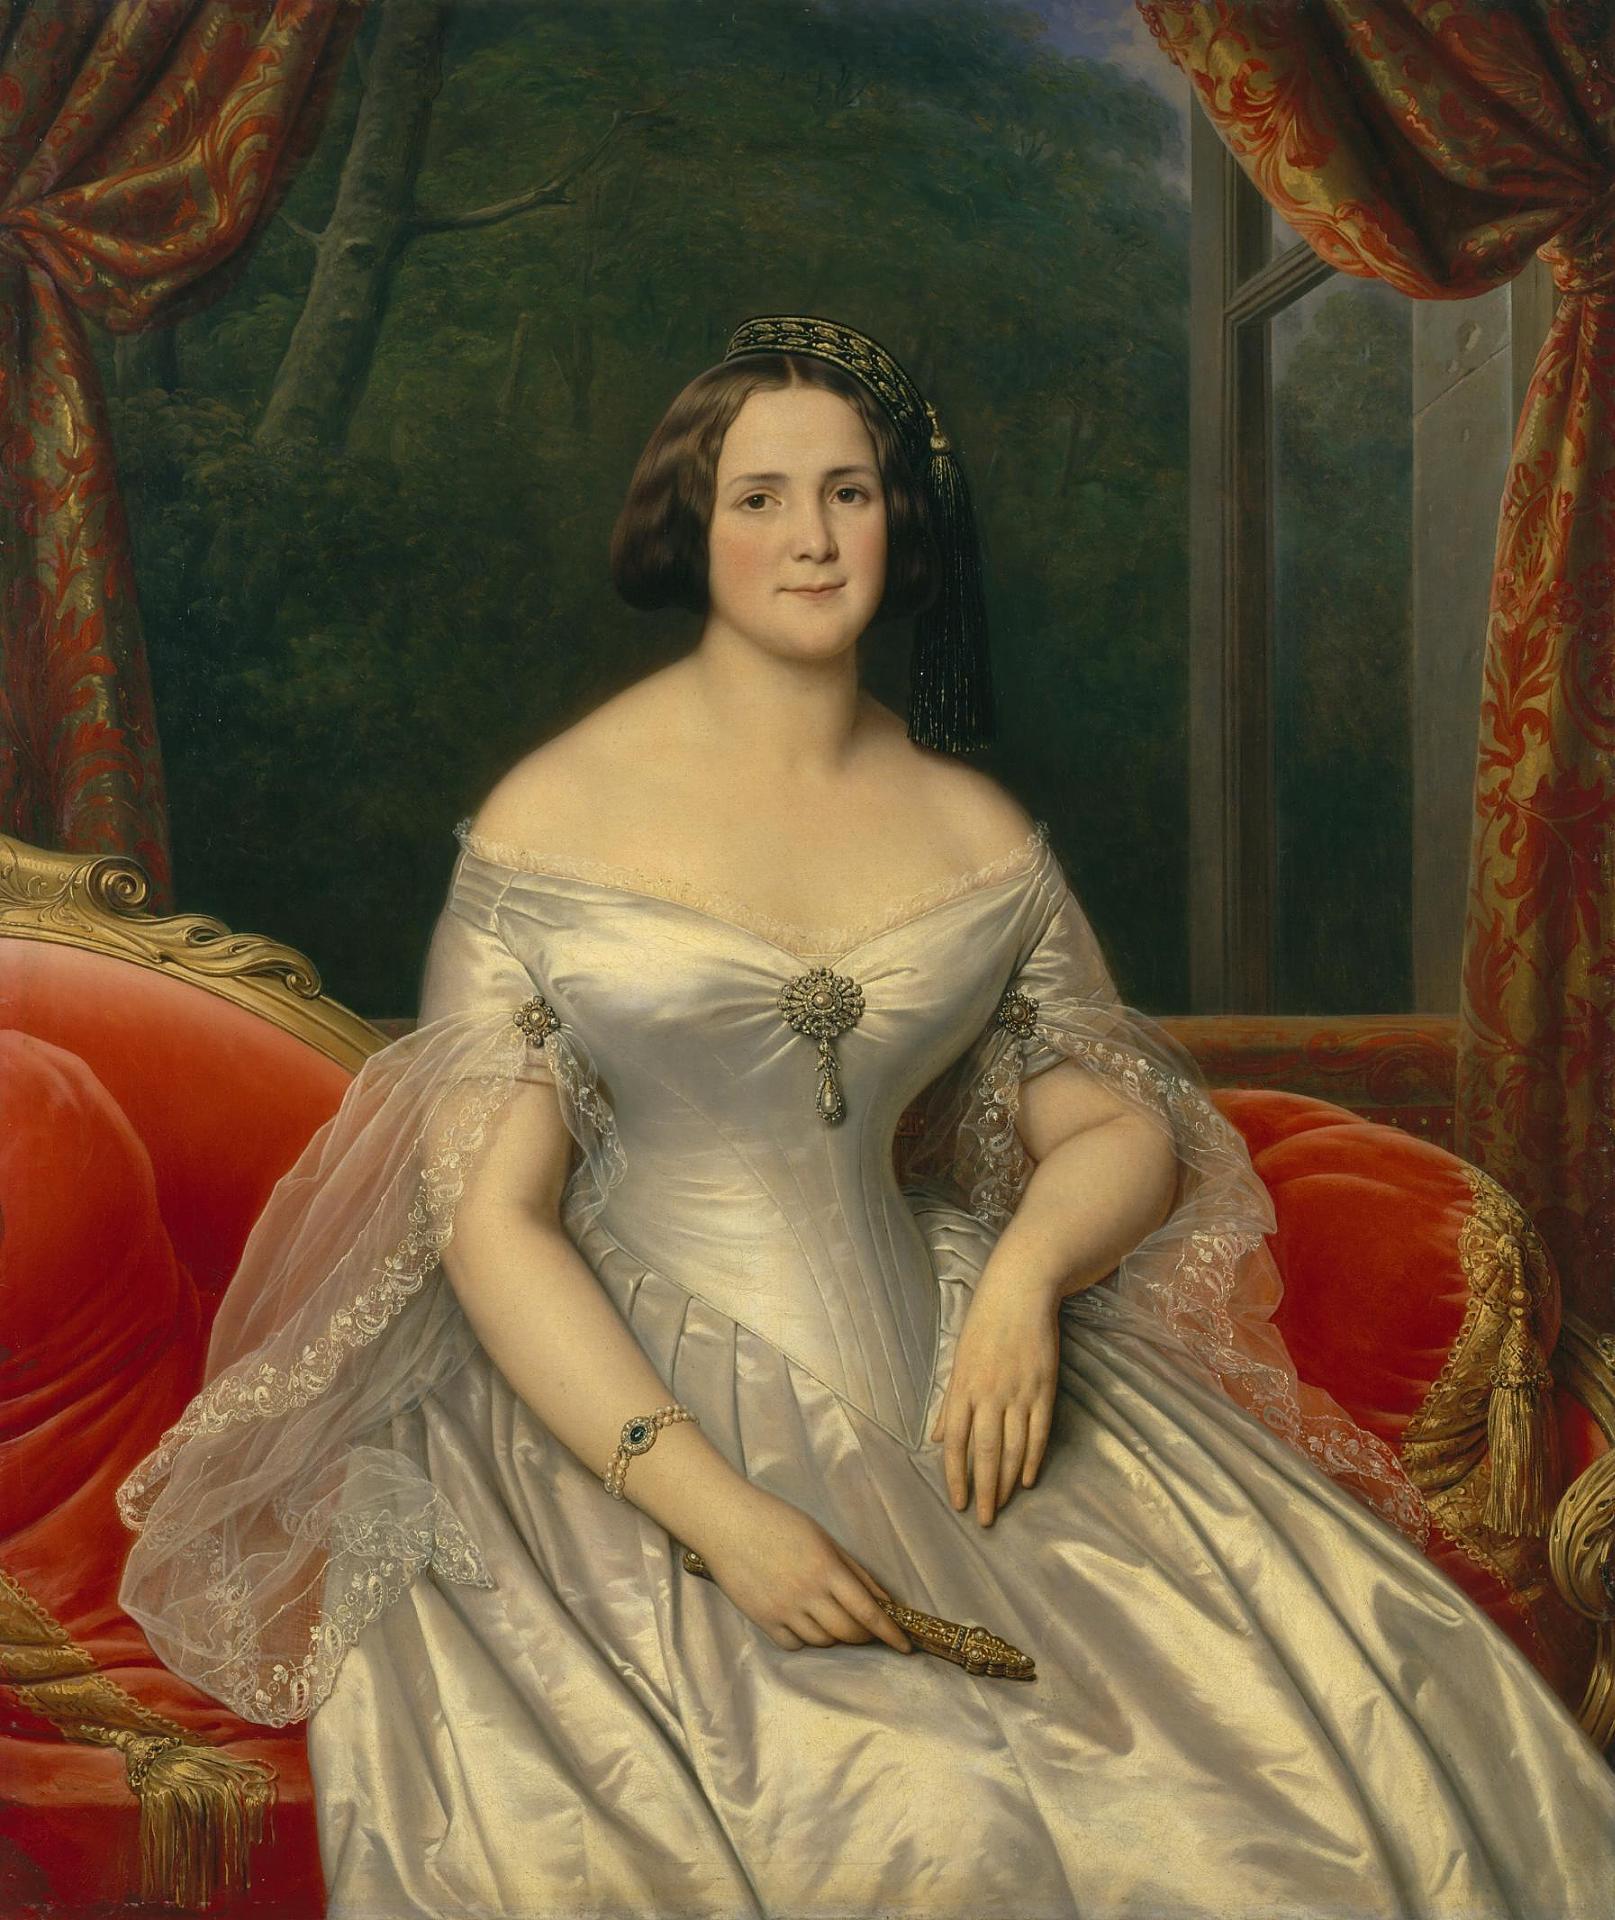 Анна Егоровна Капури, жена Дмитрия Бенардаки. Ермитаж, худ. Карл фон Штейбен, 1844 г.